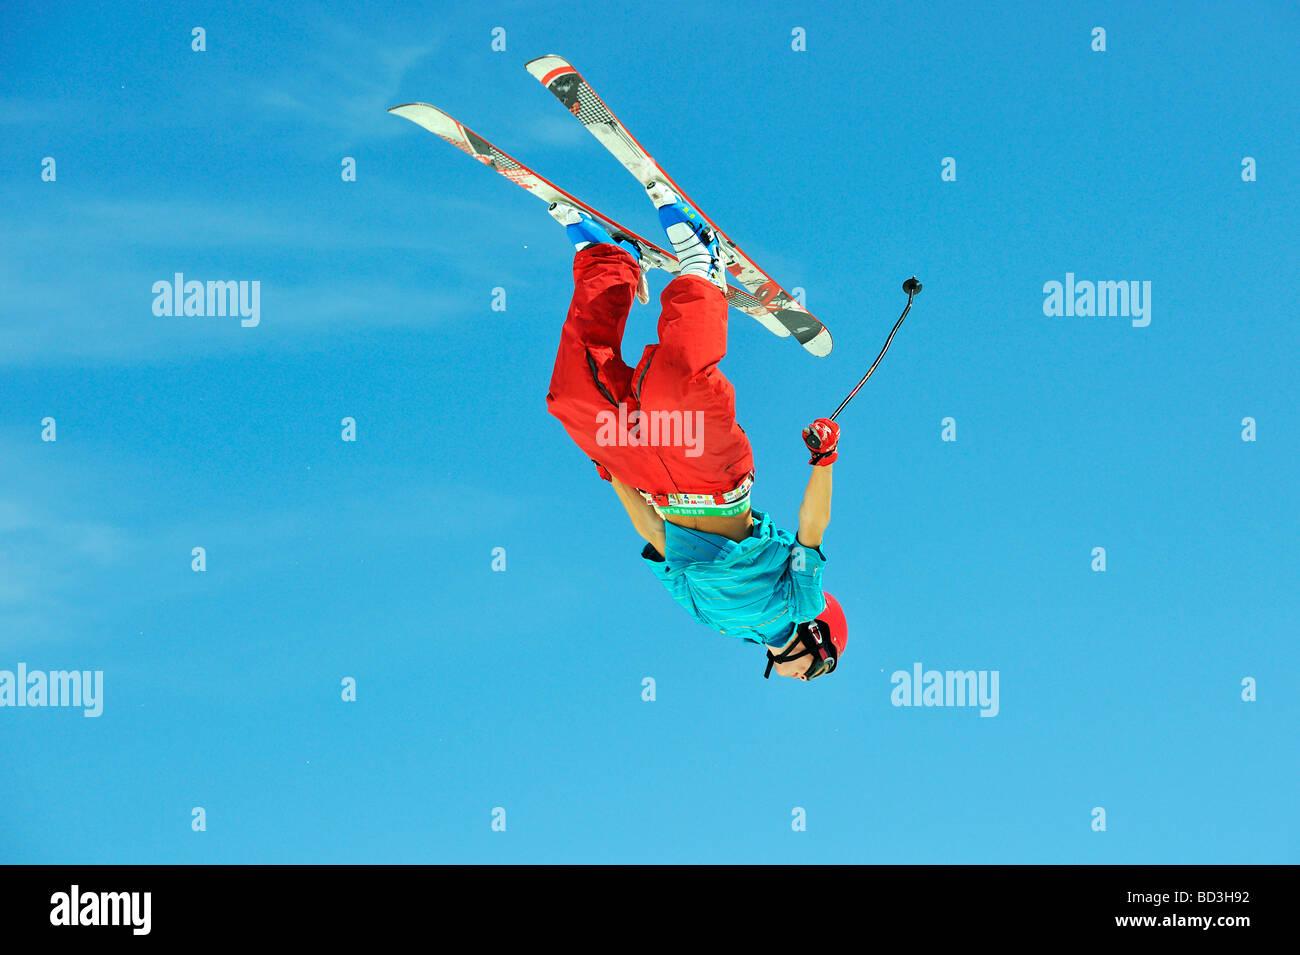 Skier back flip in total control - Stock Image